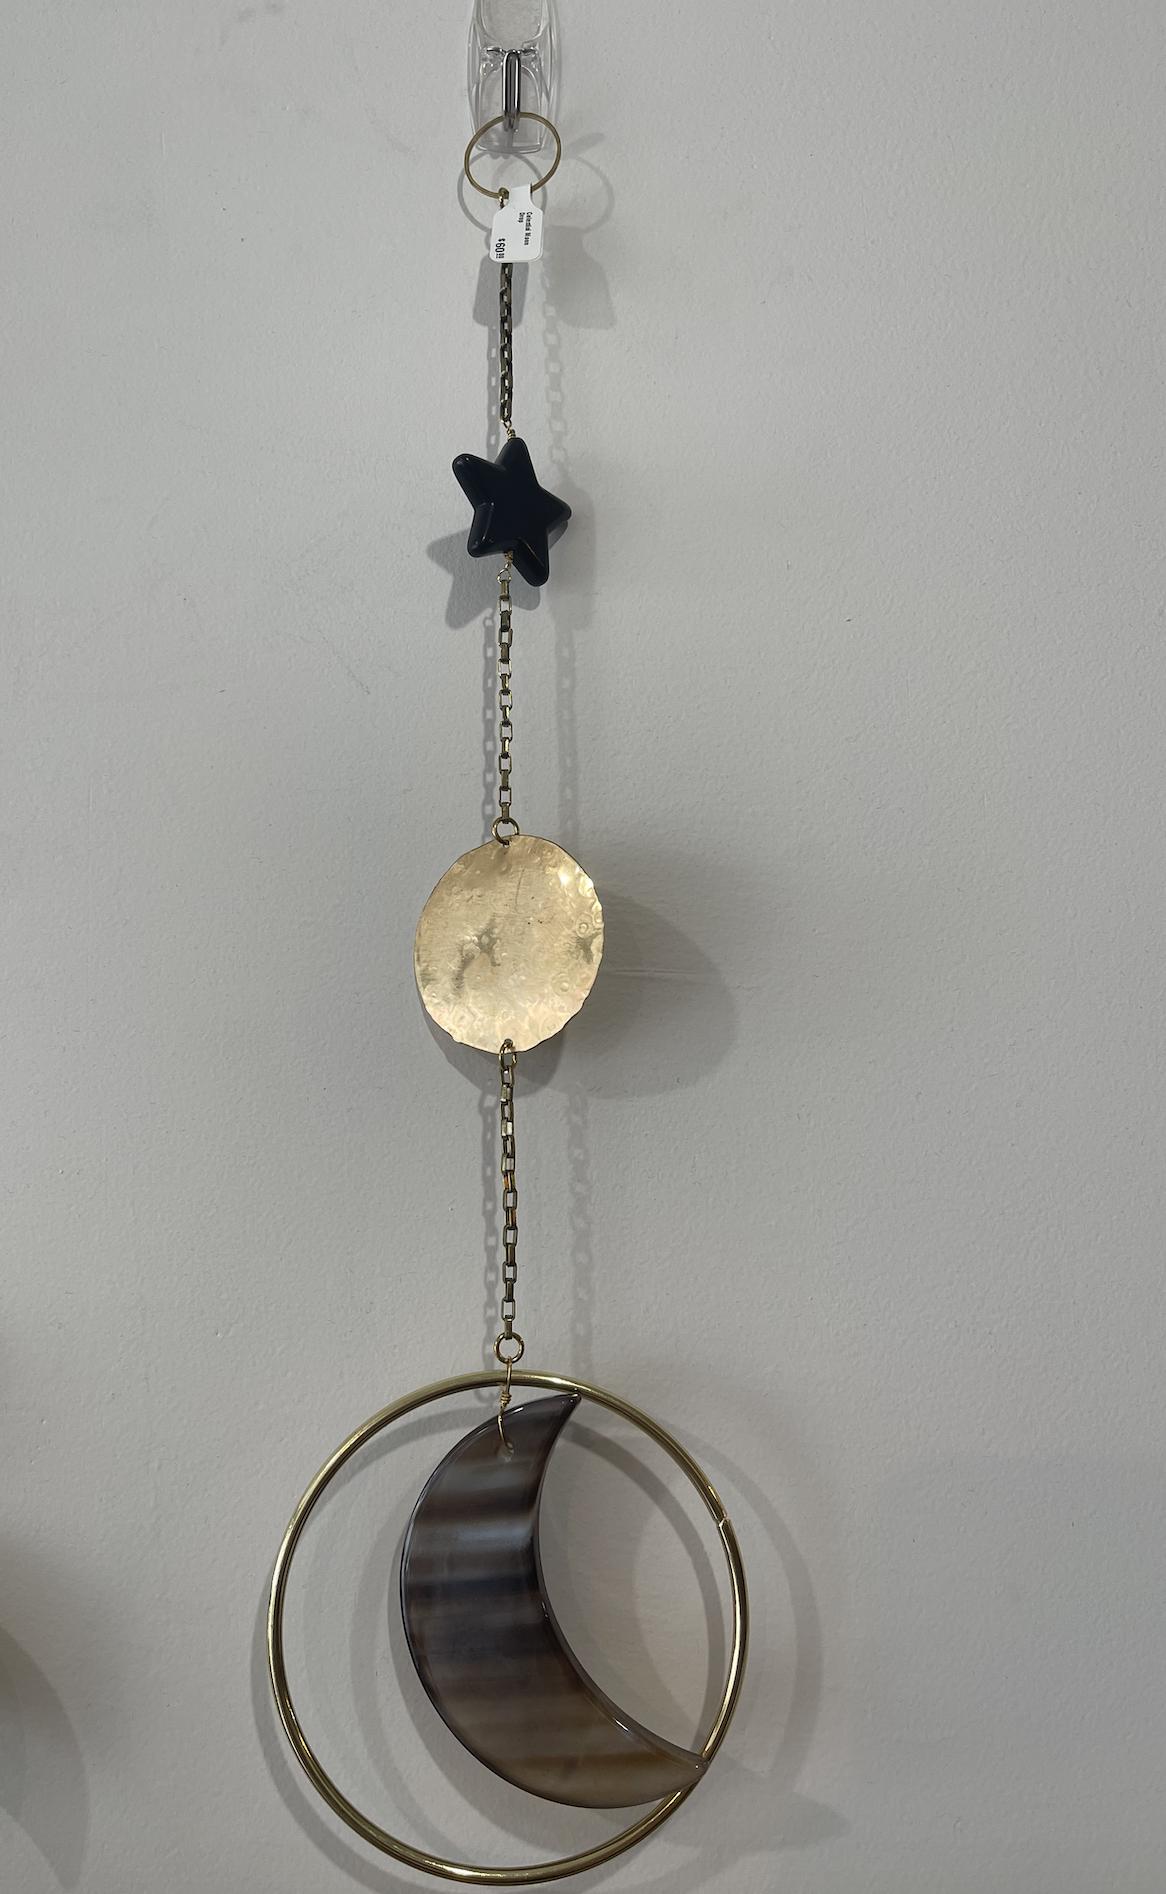 Metrix Jewelry Celestial Moon Drop Wall Hanging